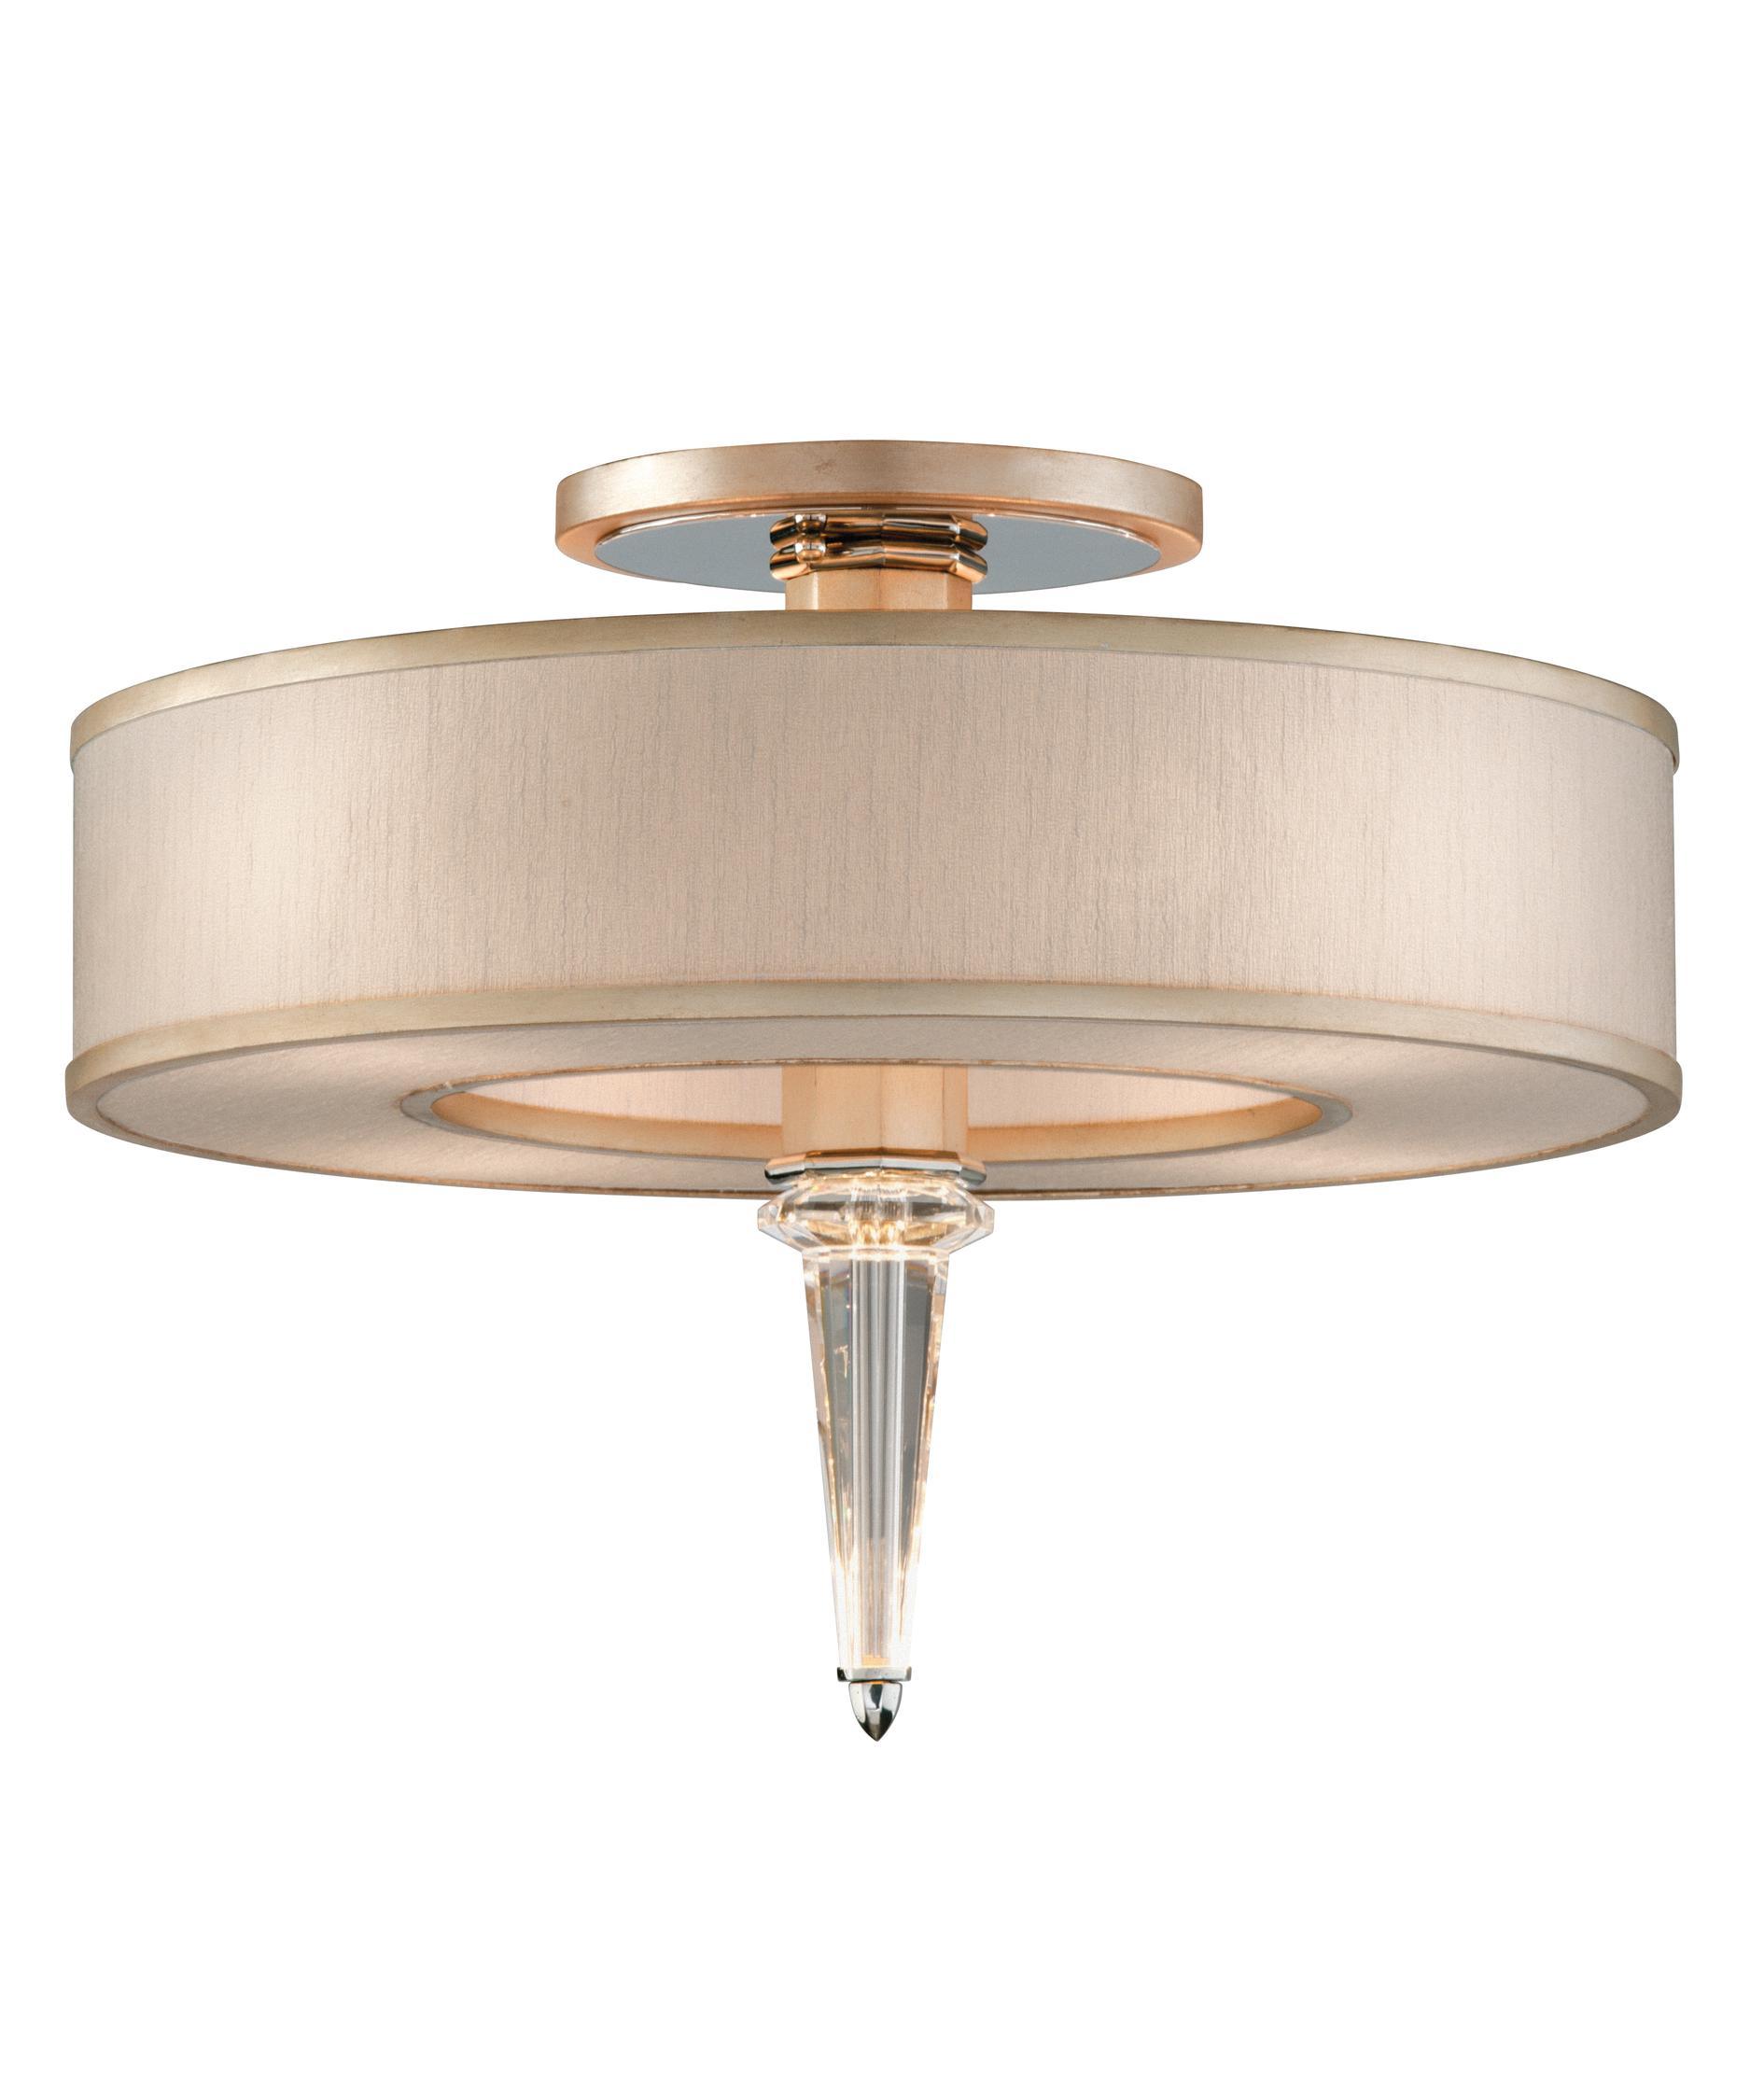 Corbett Lighting 166 34 Harlow 20 Inch Semi Flush Mount